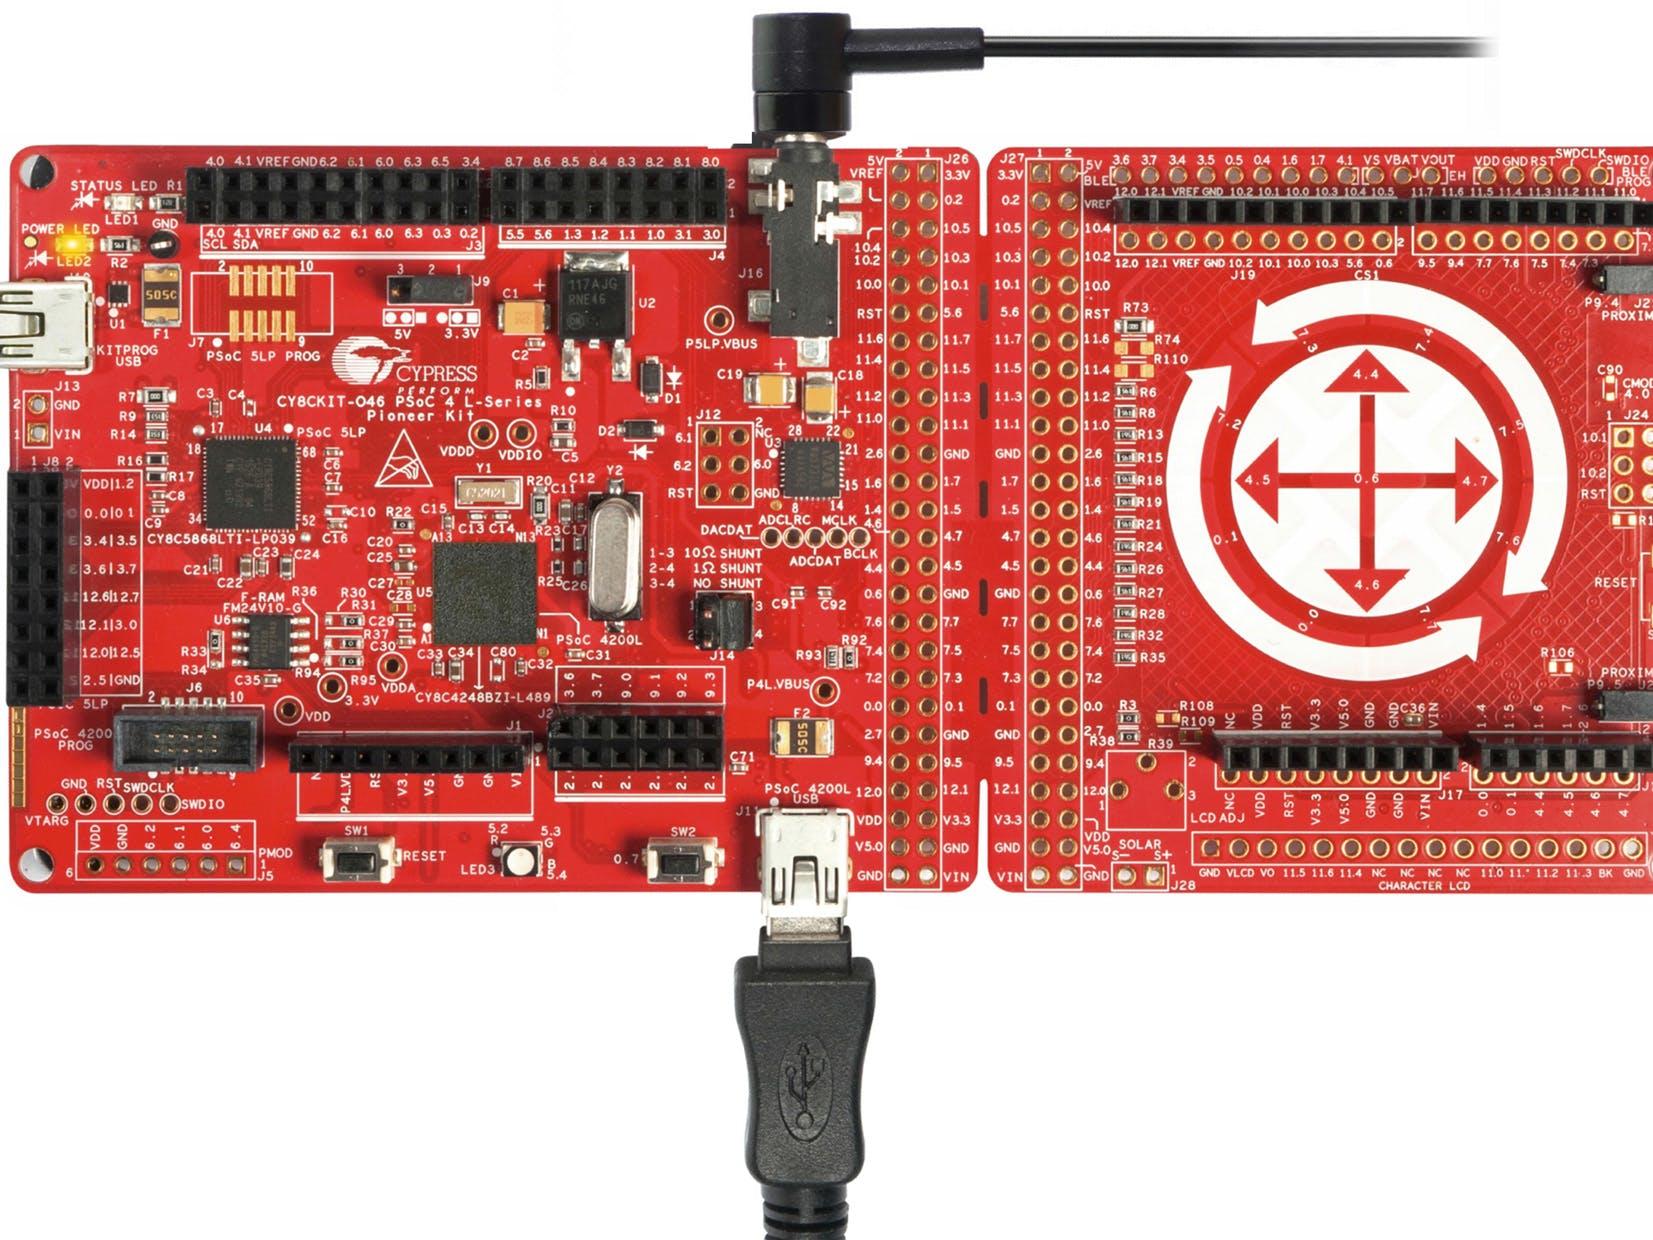 Designing PSoC4200L USB Composite Device